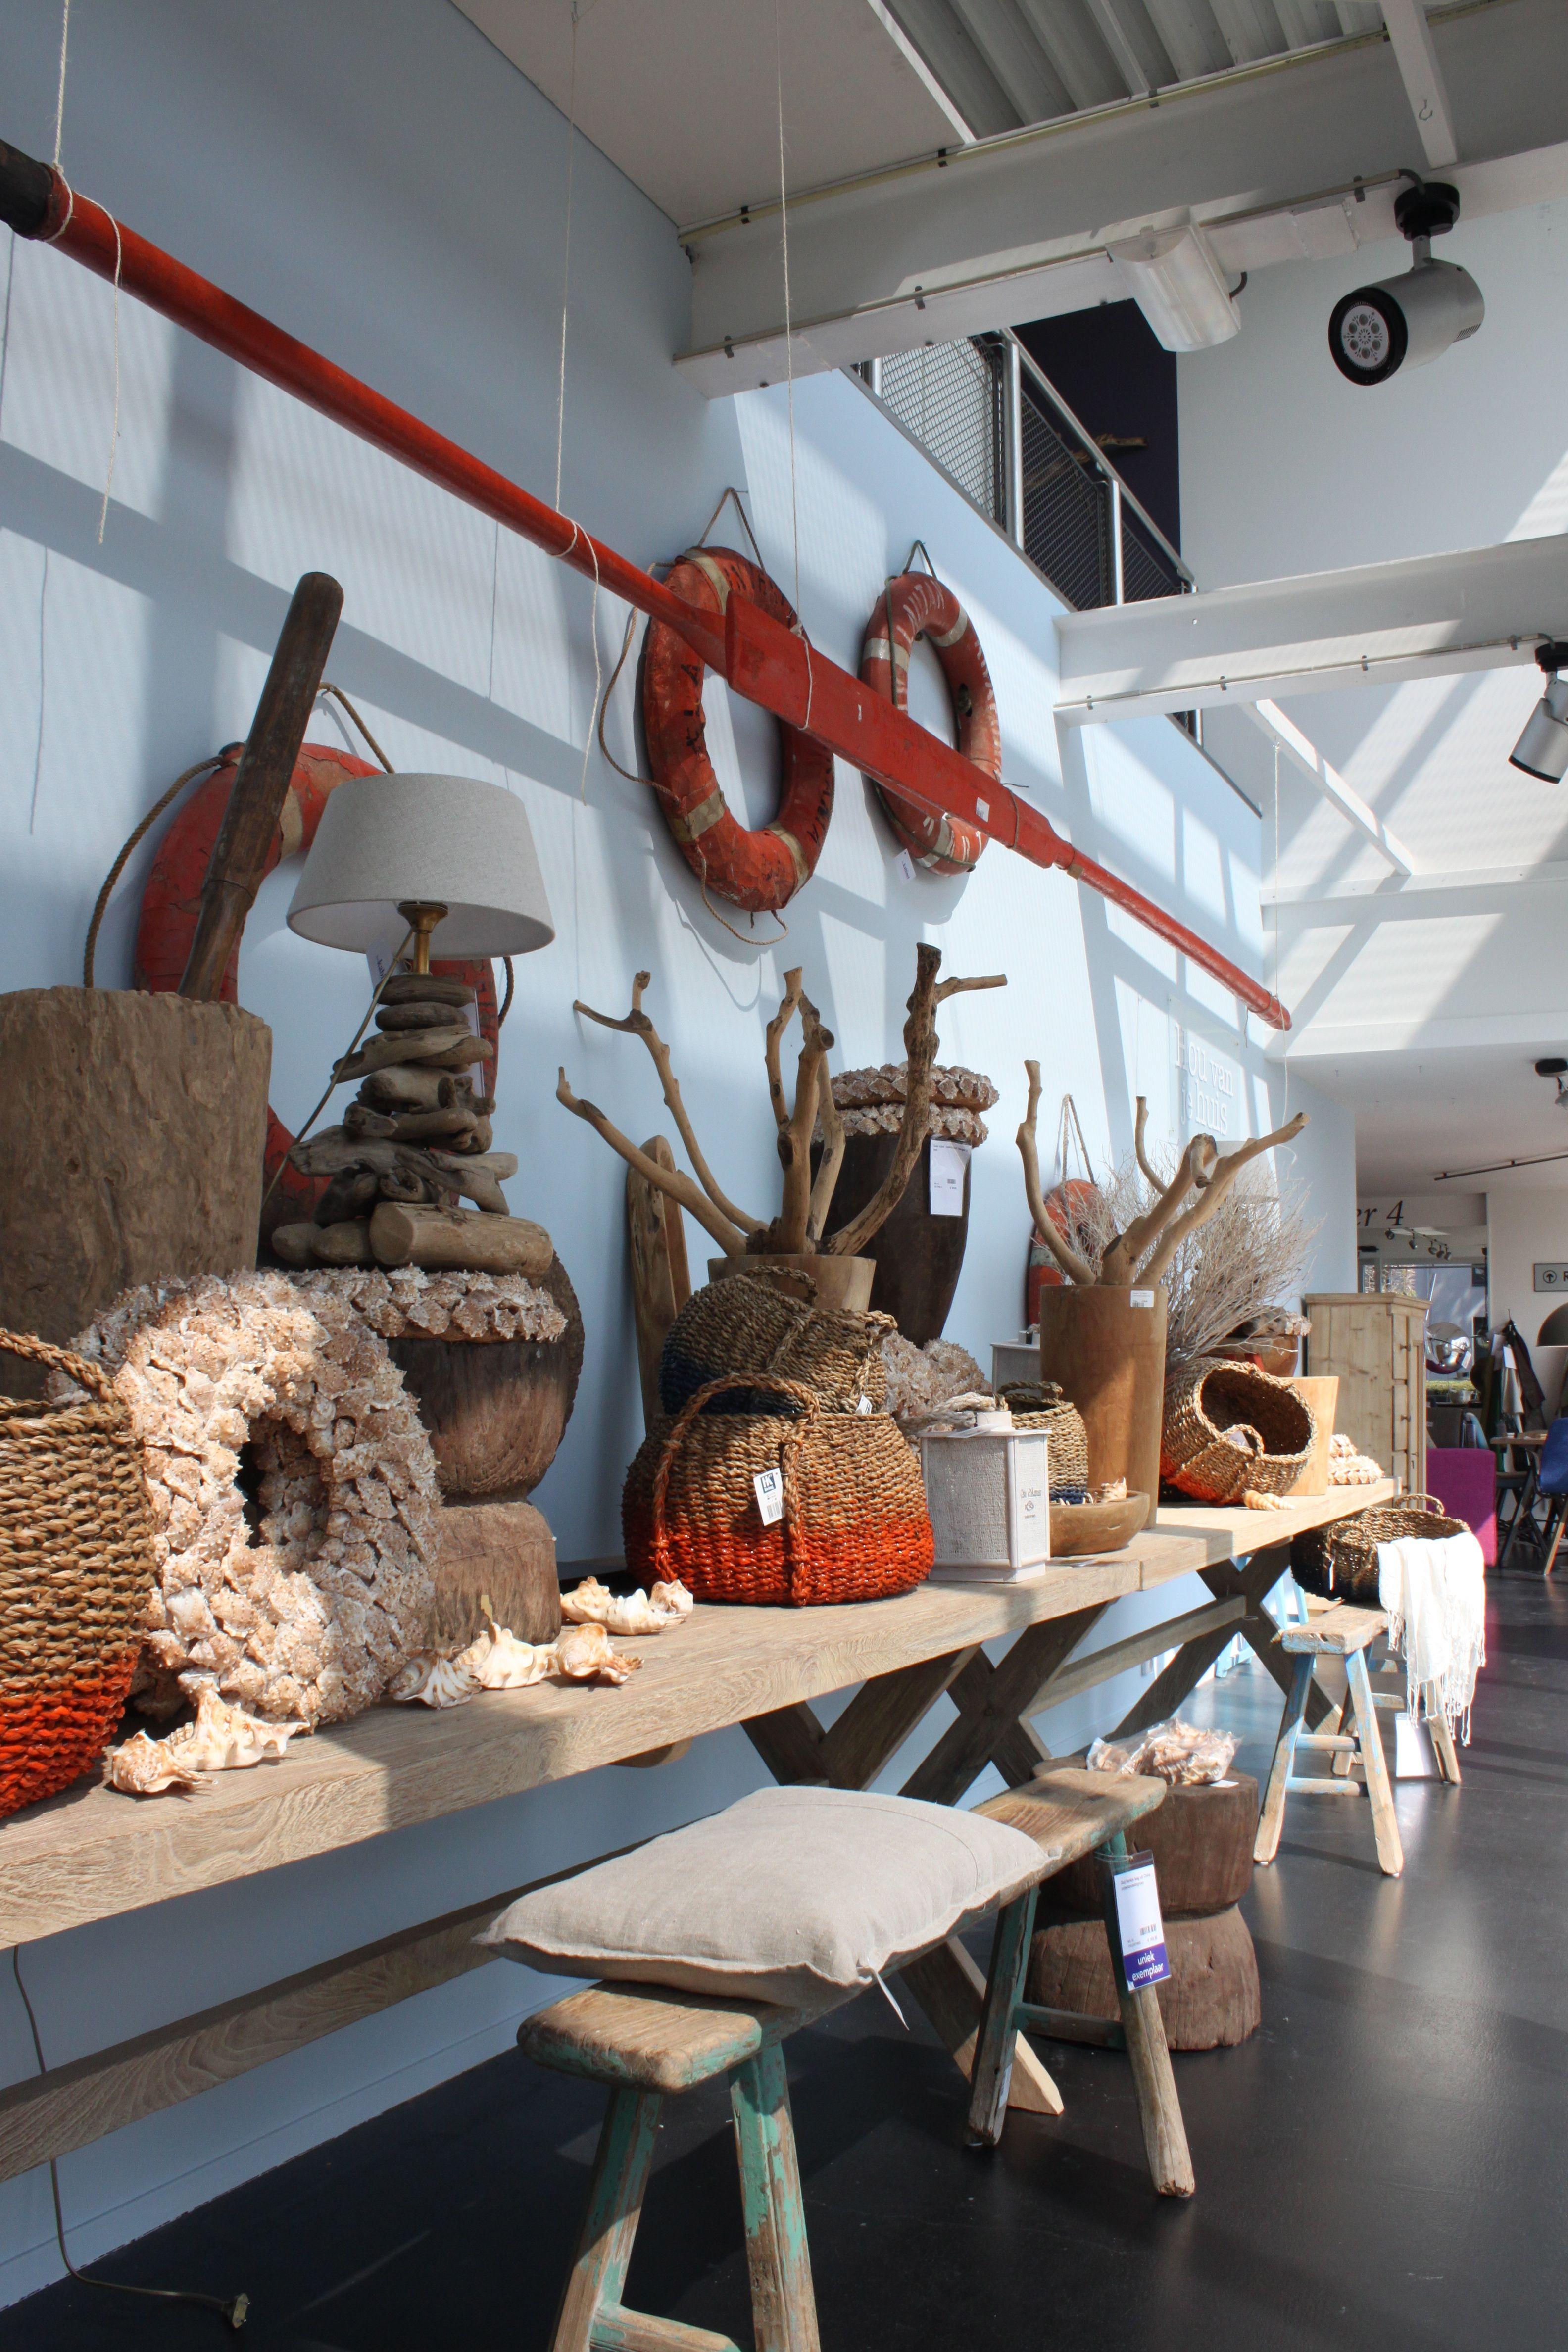 Etalage zomer - strandjutter #instore #hetkabinet #winkel #interieur ...